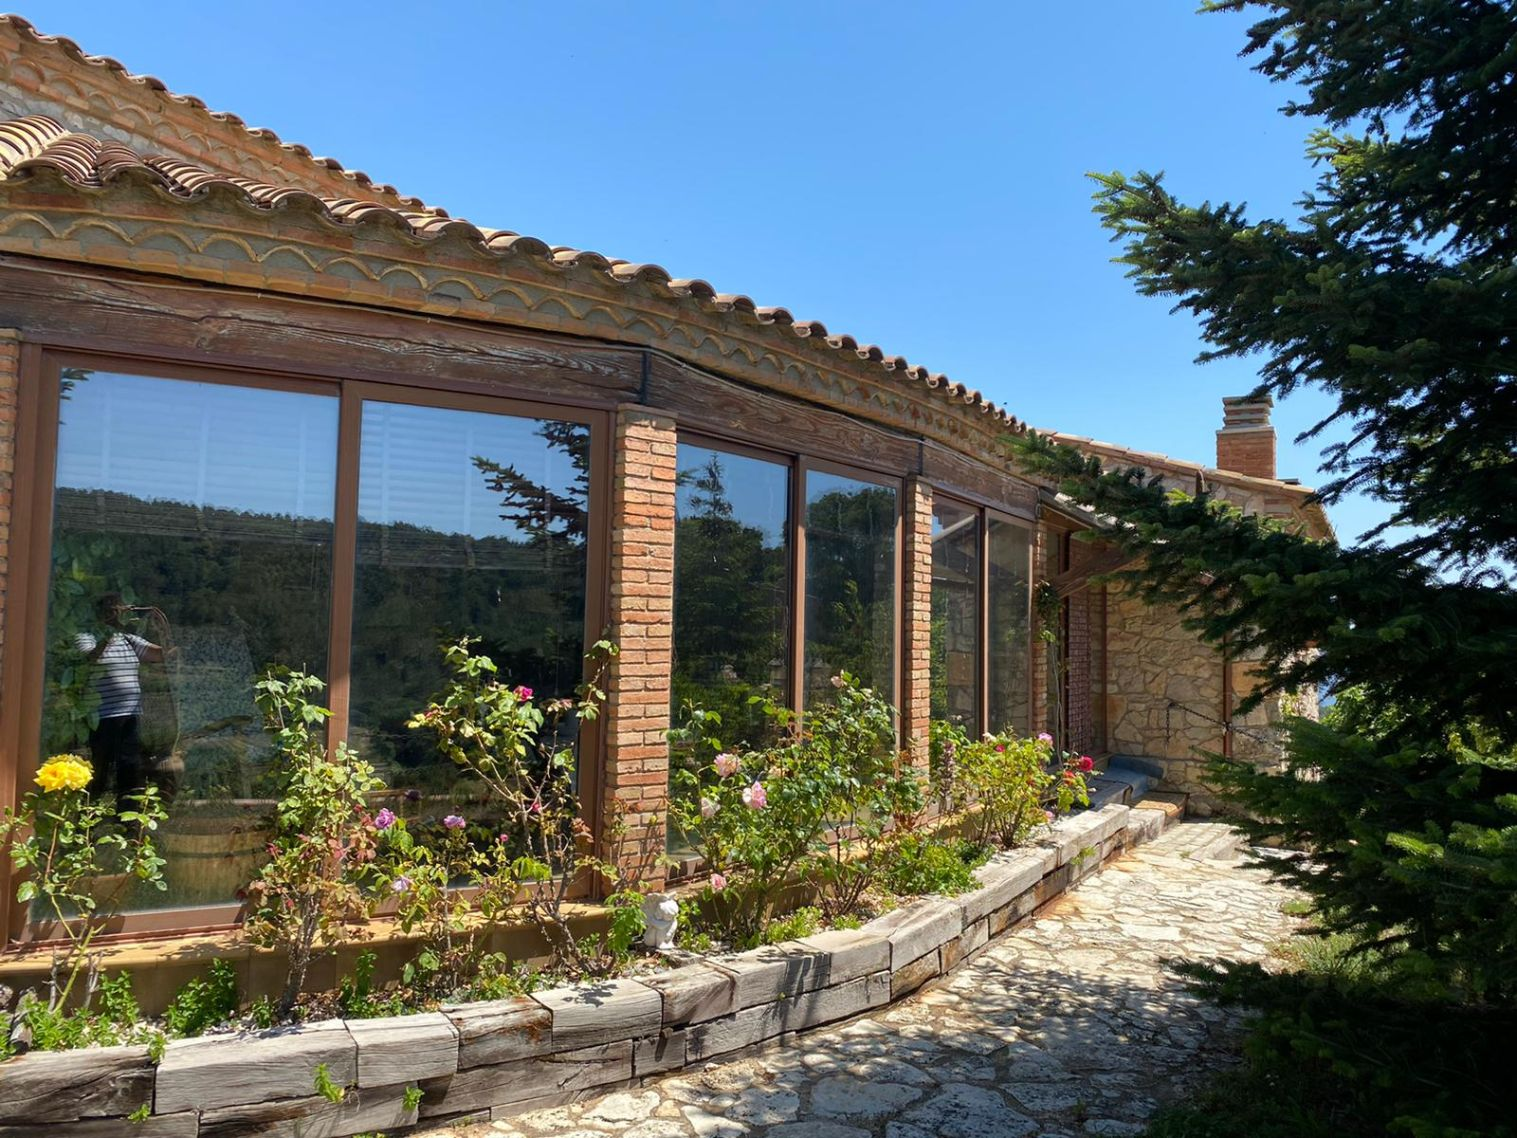 Casa  Carrer de rojals. Rojals (montblanc) en venta gran casa con magníficas vistas